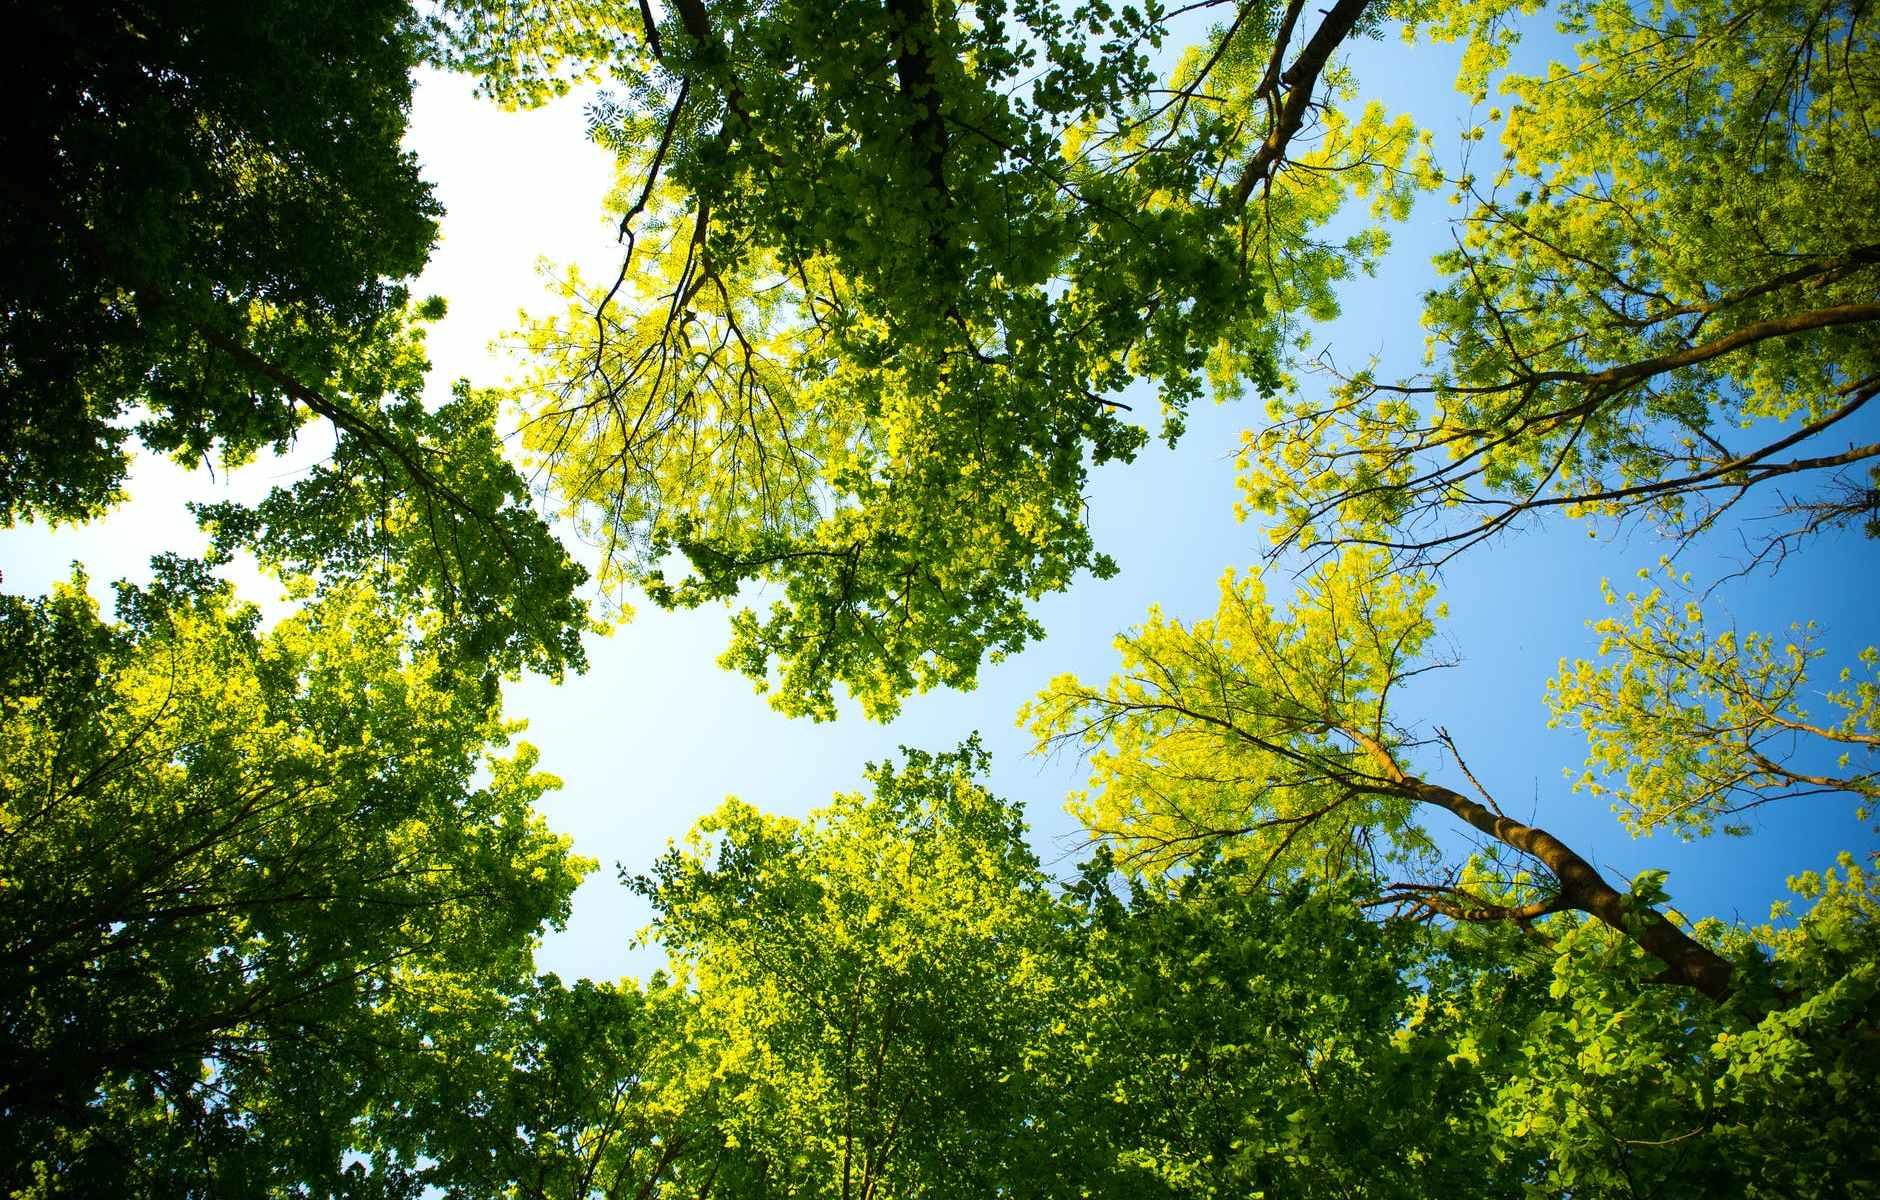 alberi-trees-foglie-cielo-sky-verde